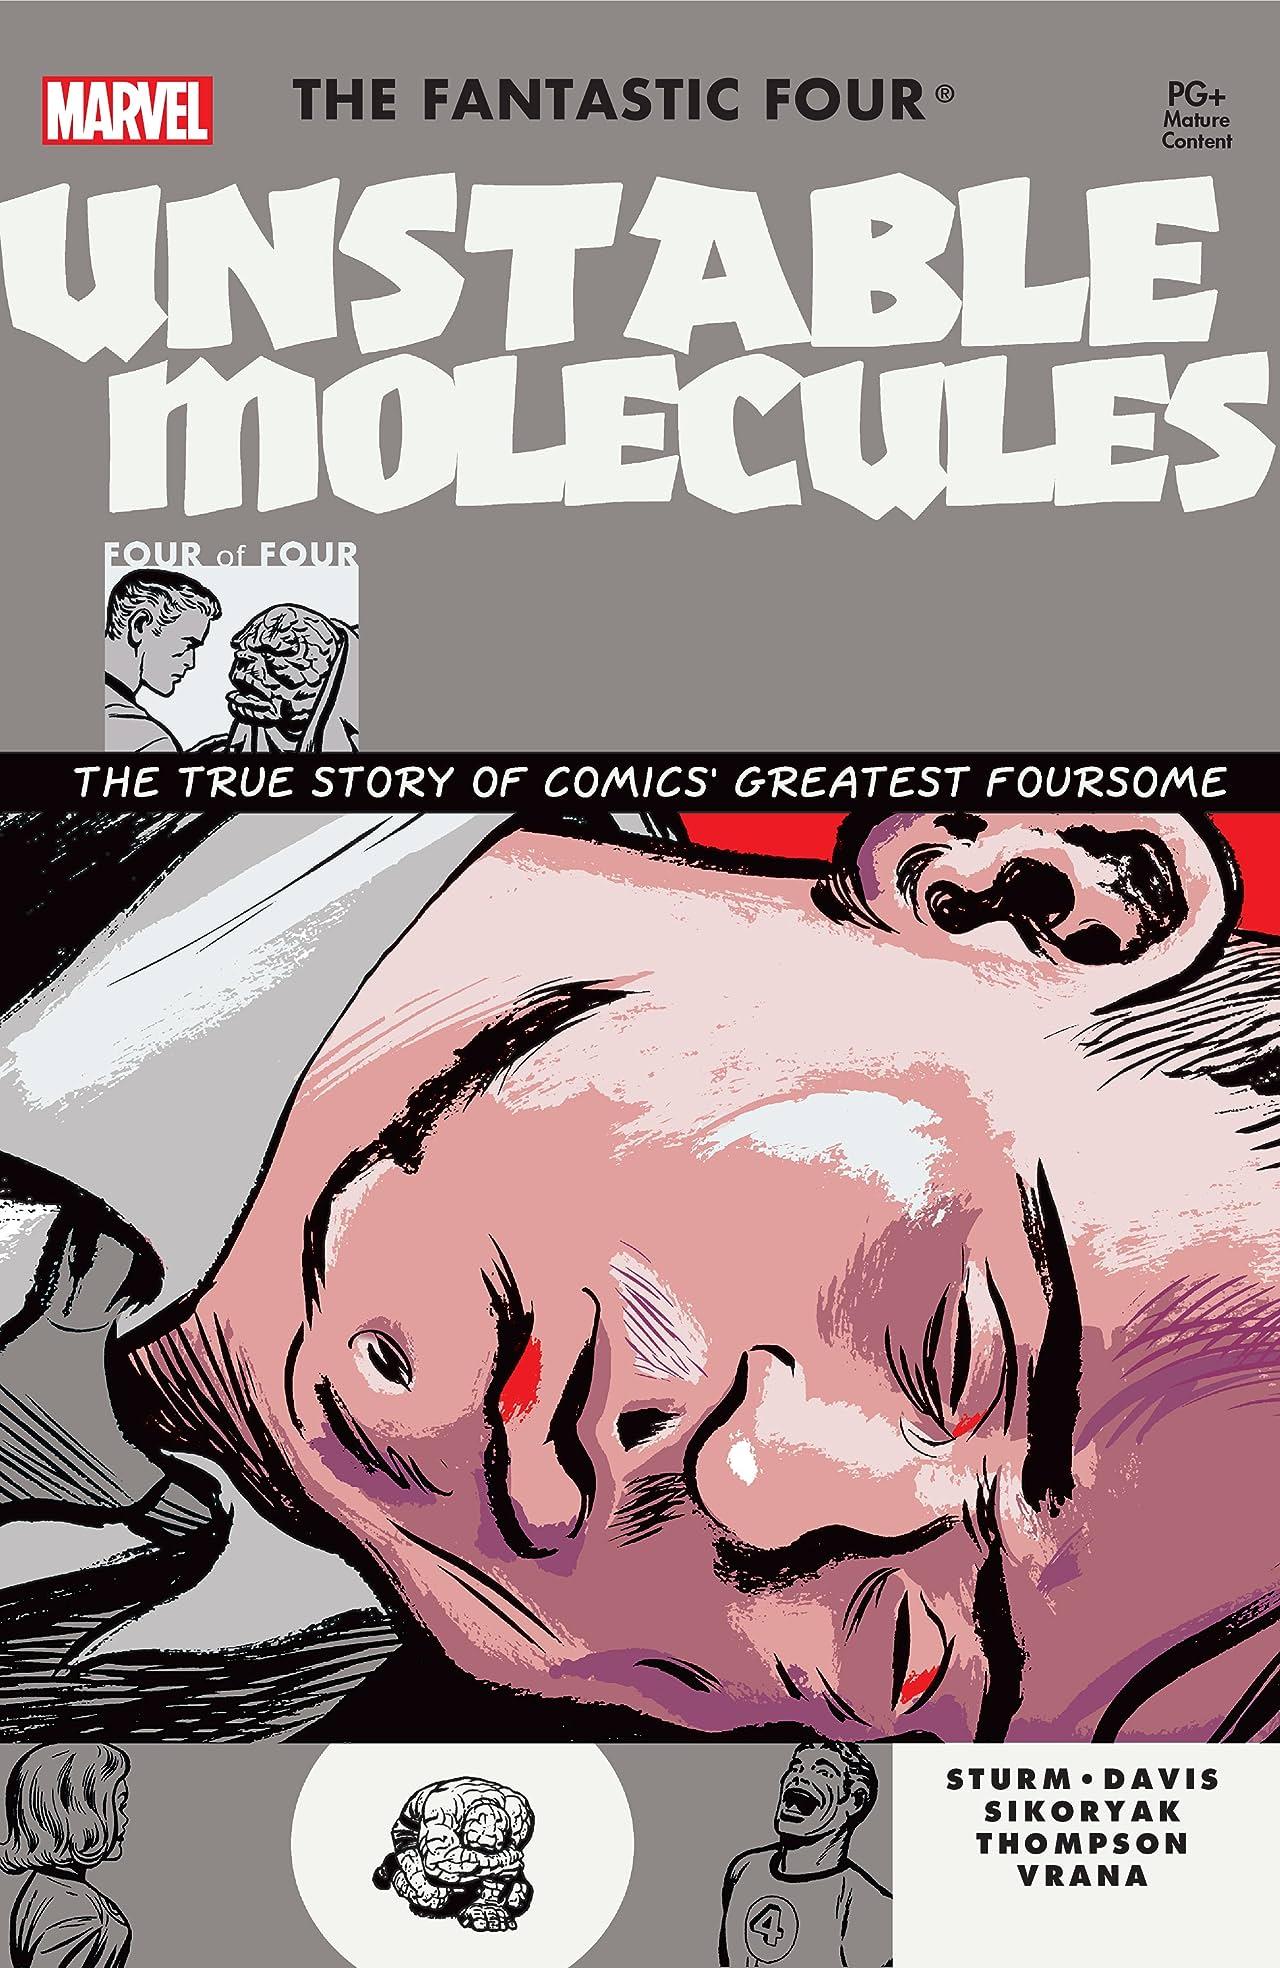 Startling Stories: Fantastic Four - Unstable Molecules (2003) #4 (of 4)